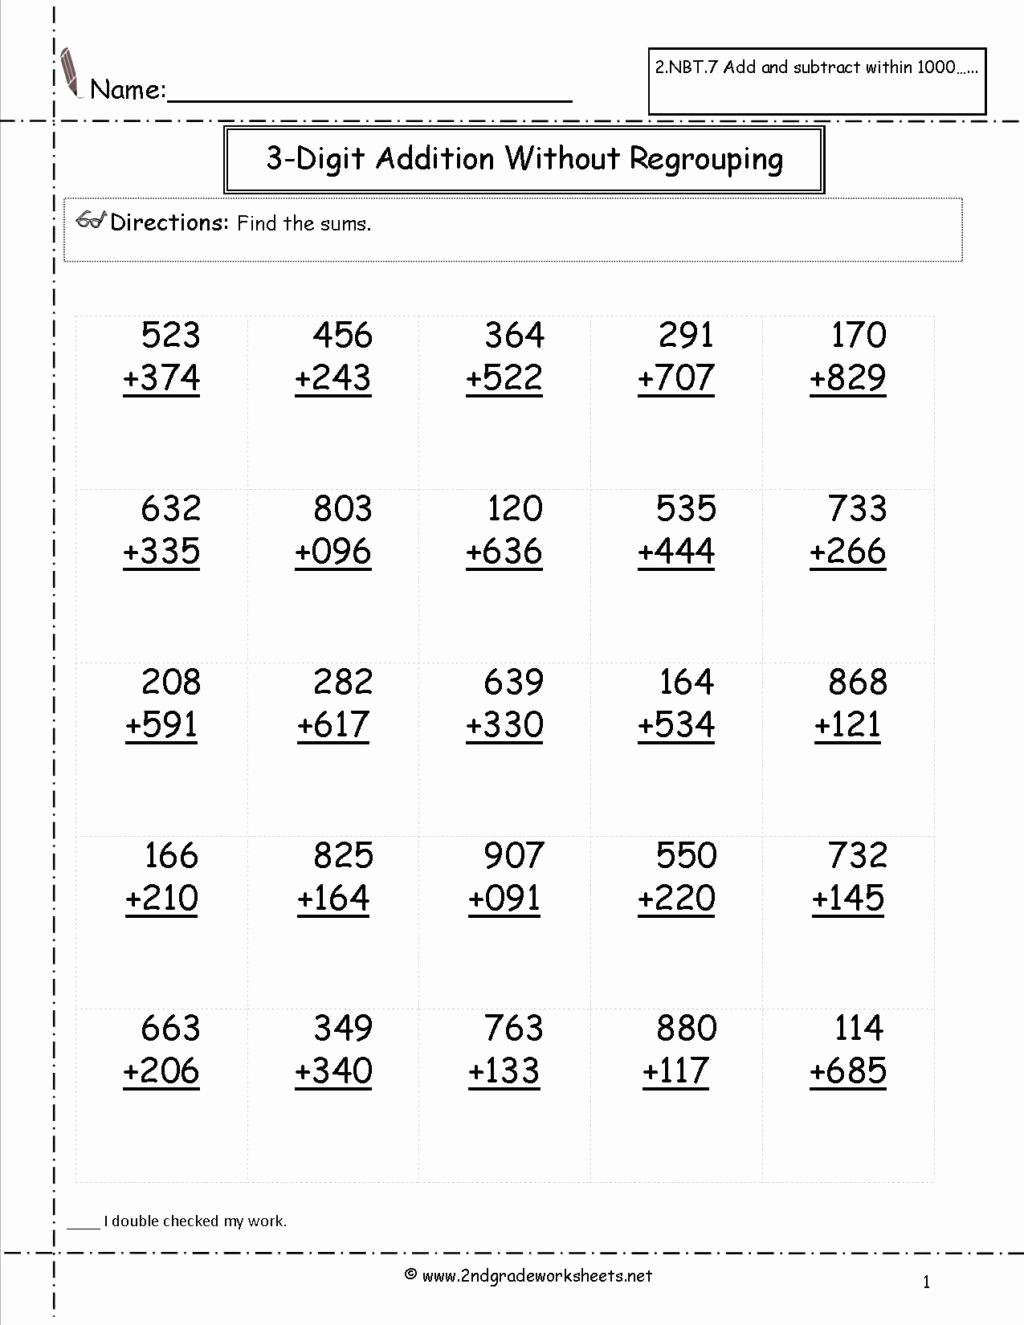 Regrouping Fractions Worksheet Elegant 30 Regrouping Fractions Worksheet